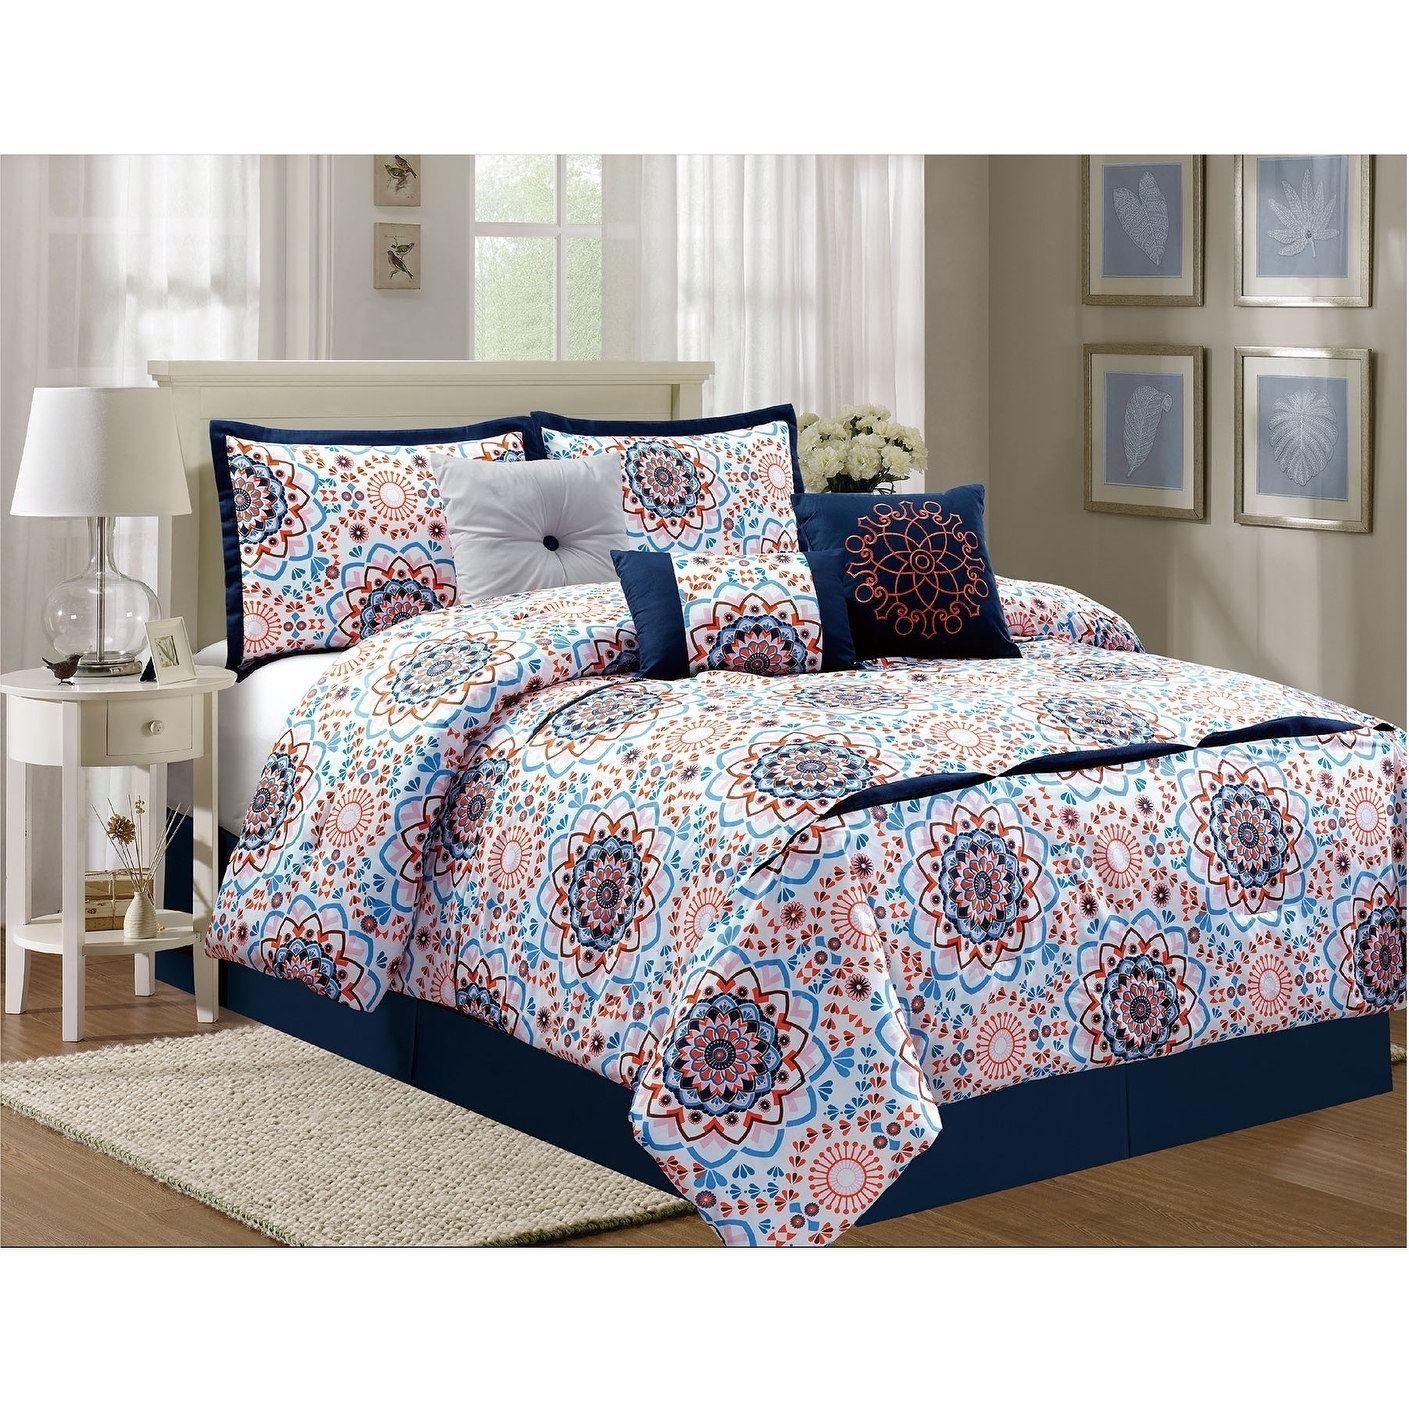 Sunshine Luxury 7 Piece Comforter Set Queen Twin Twin Xl Blue